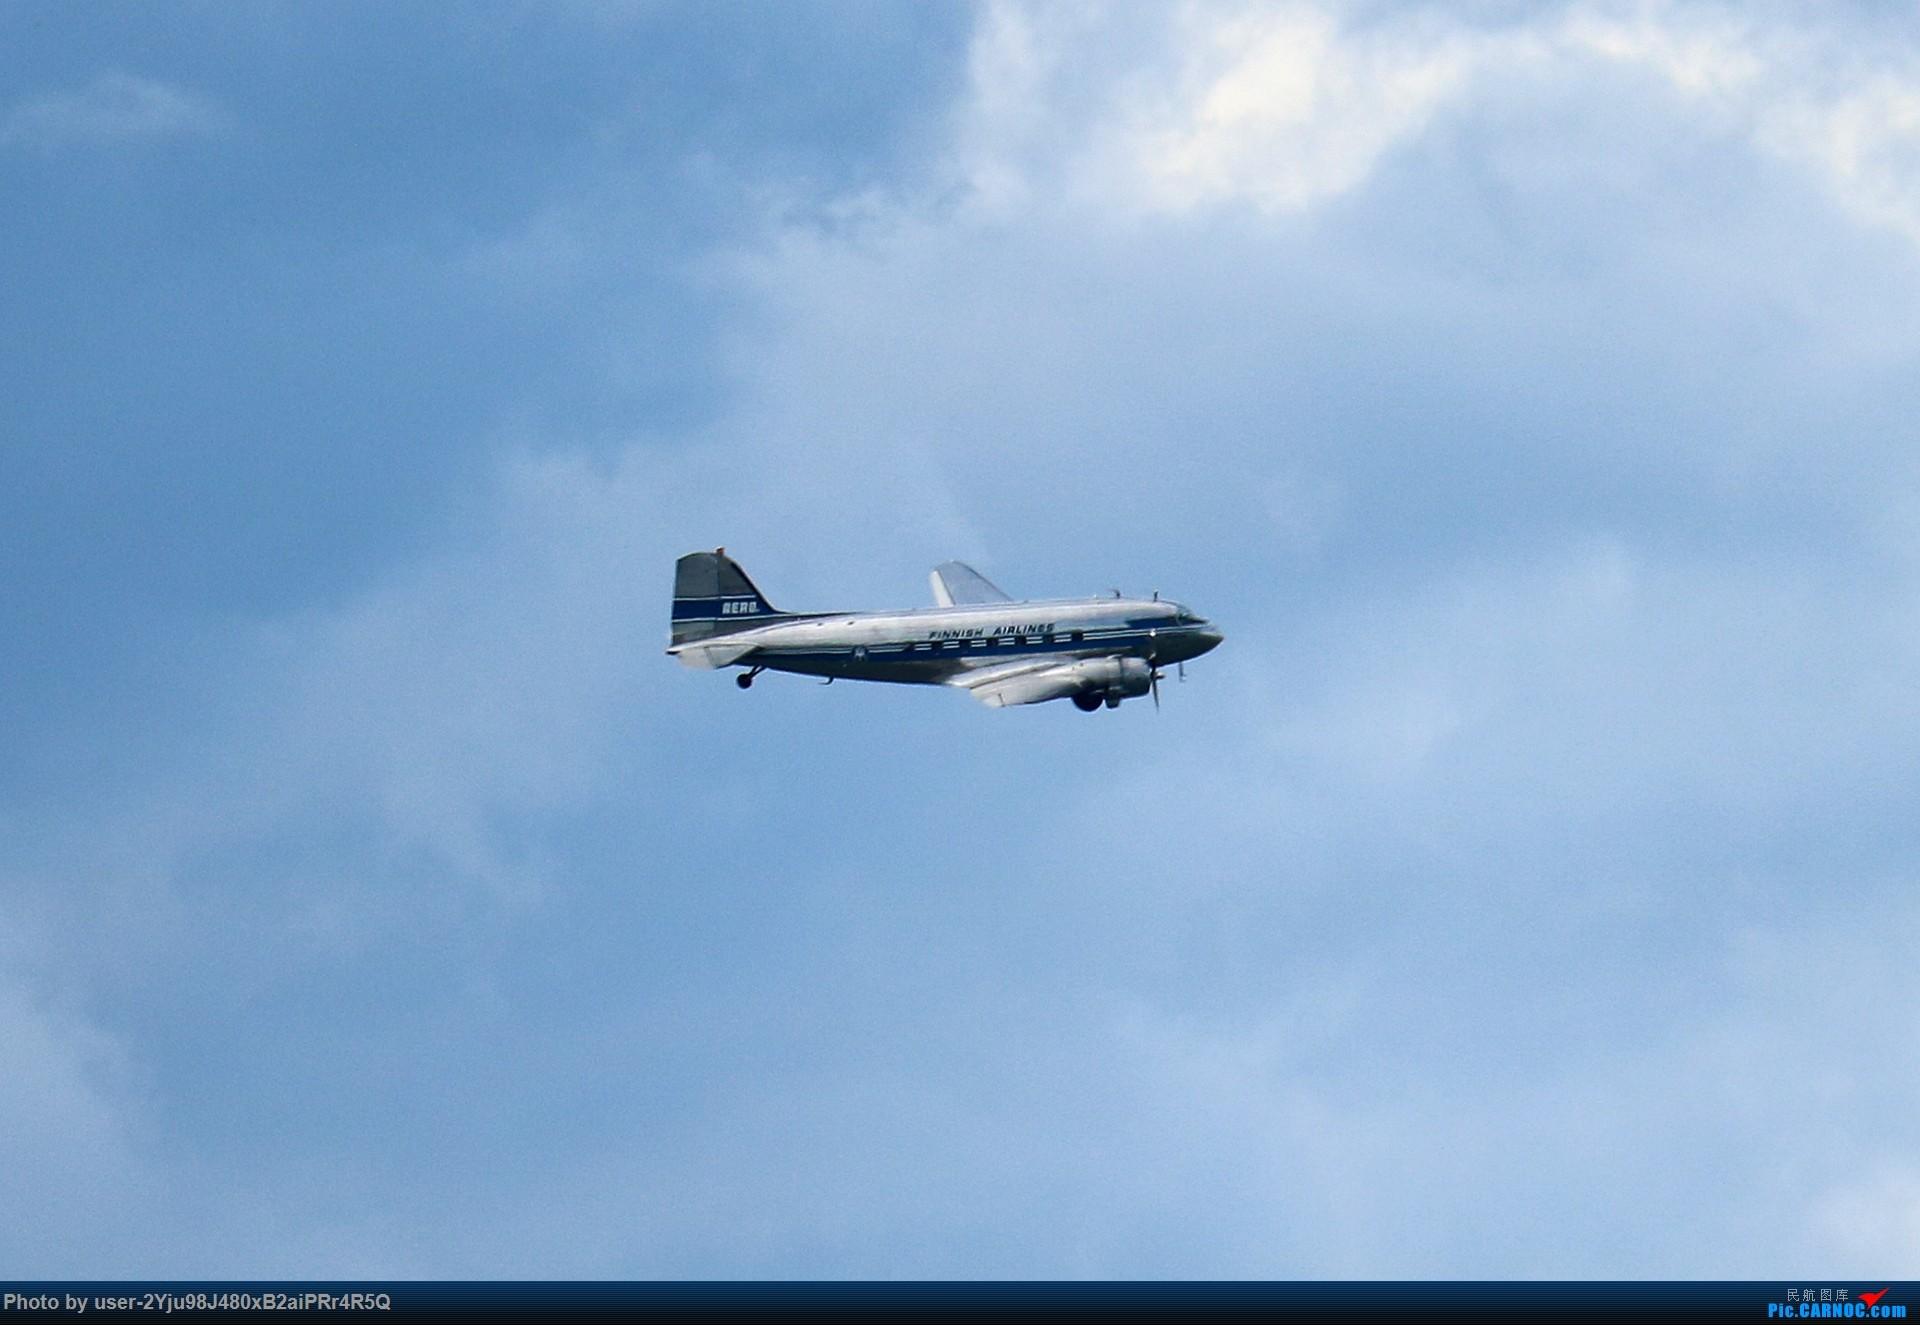 Re:LIULIU瑞典芬兰行Ⅰ|在赫尔辛基上空活着的DC-3 DOUGLAS DC-3 OH-LCH Suomenlinna, Helsinki